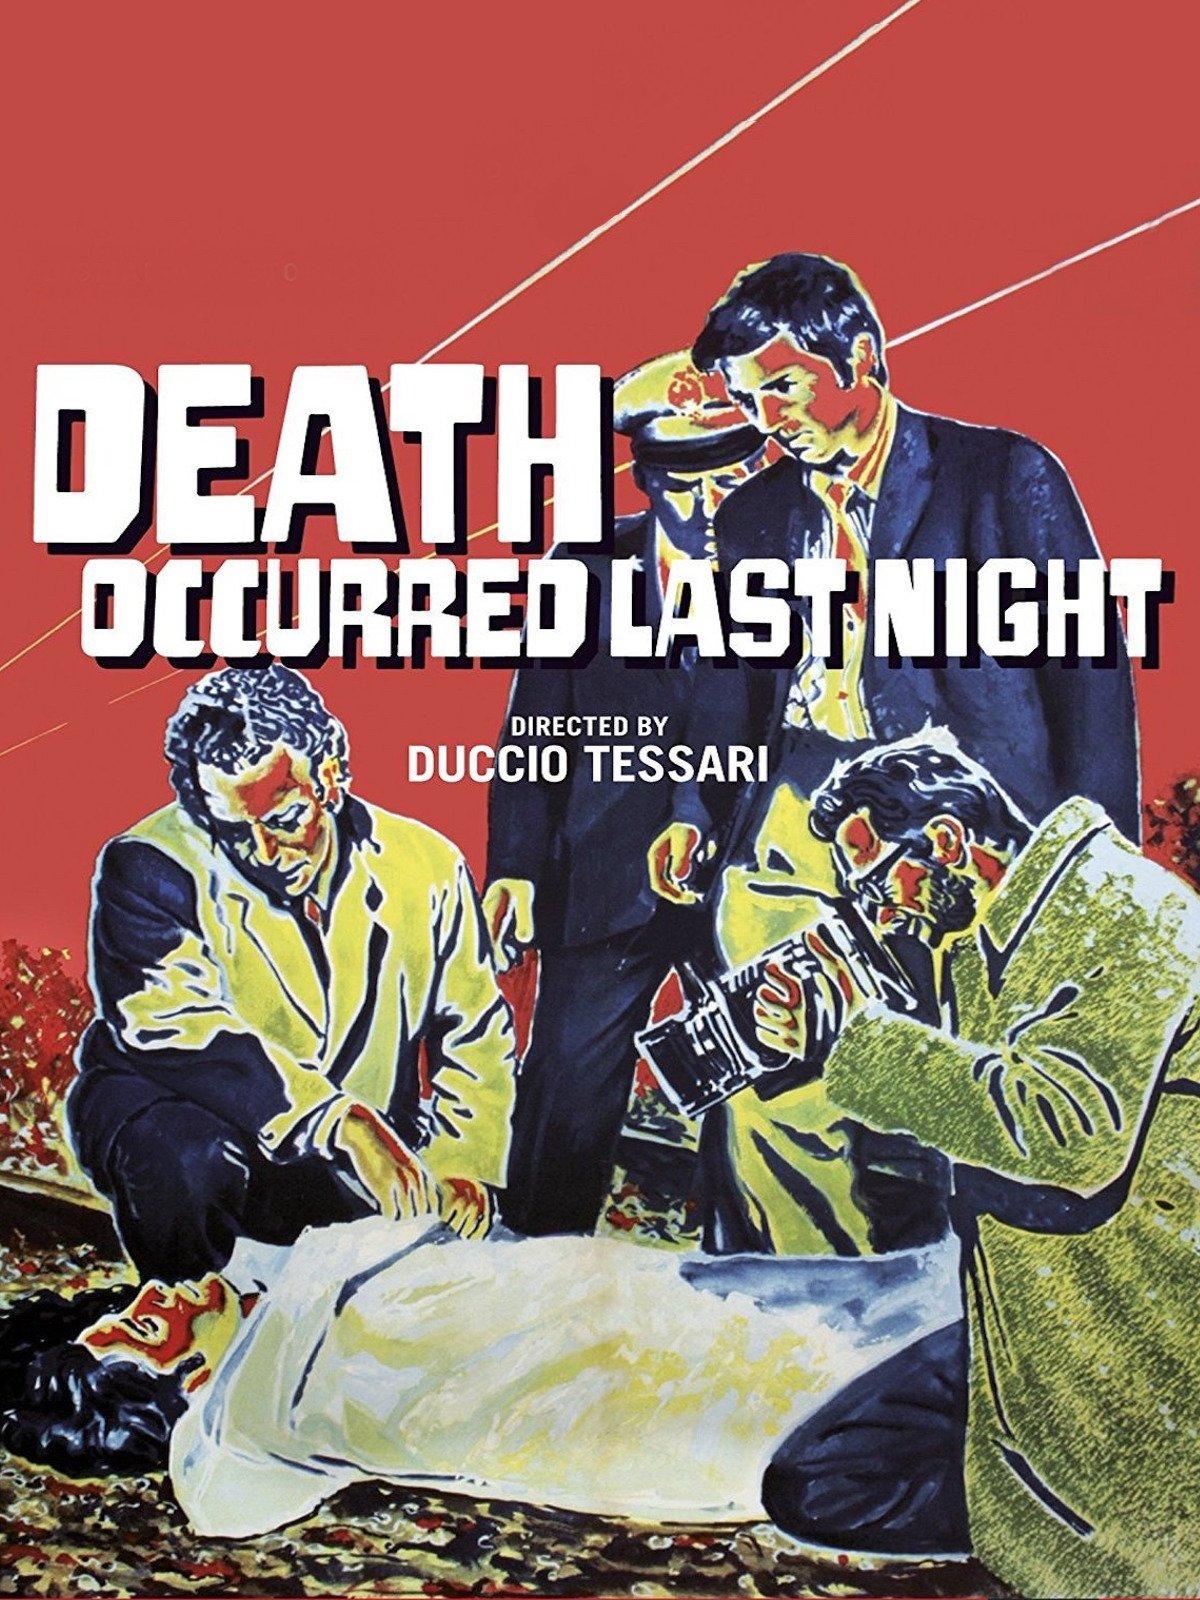 Death Occurred Last Night